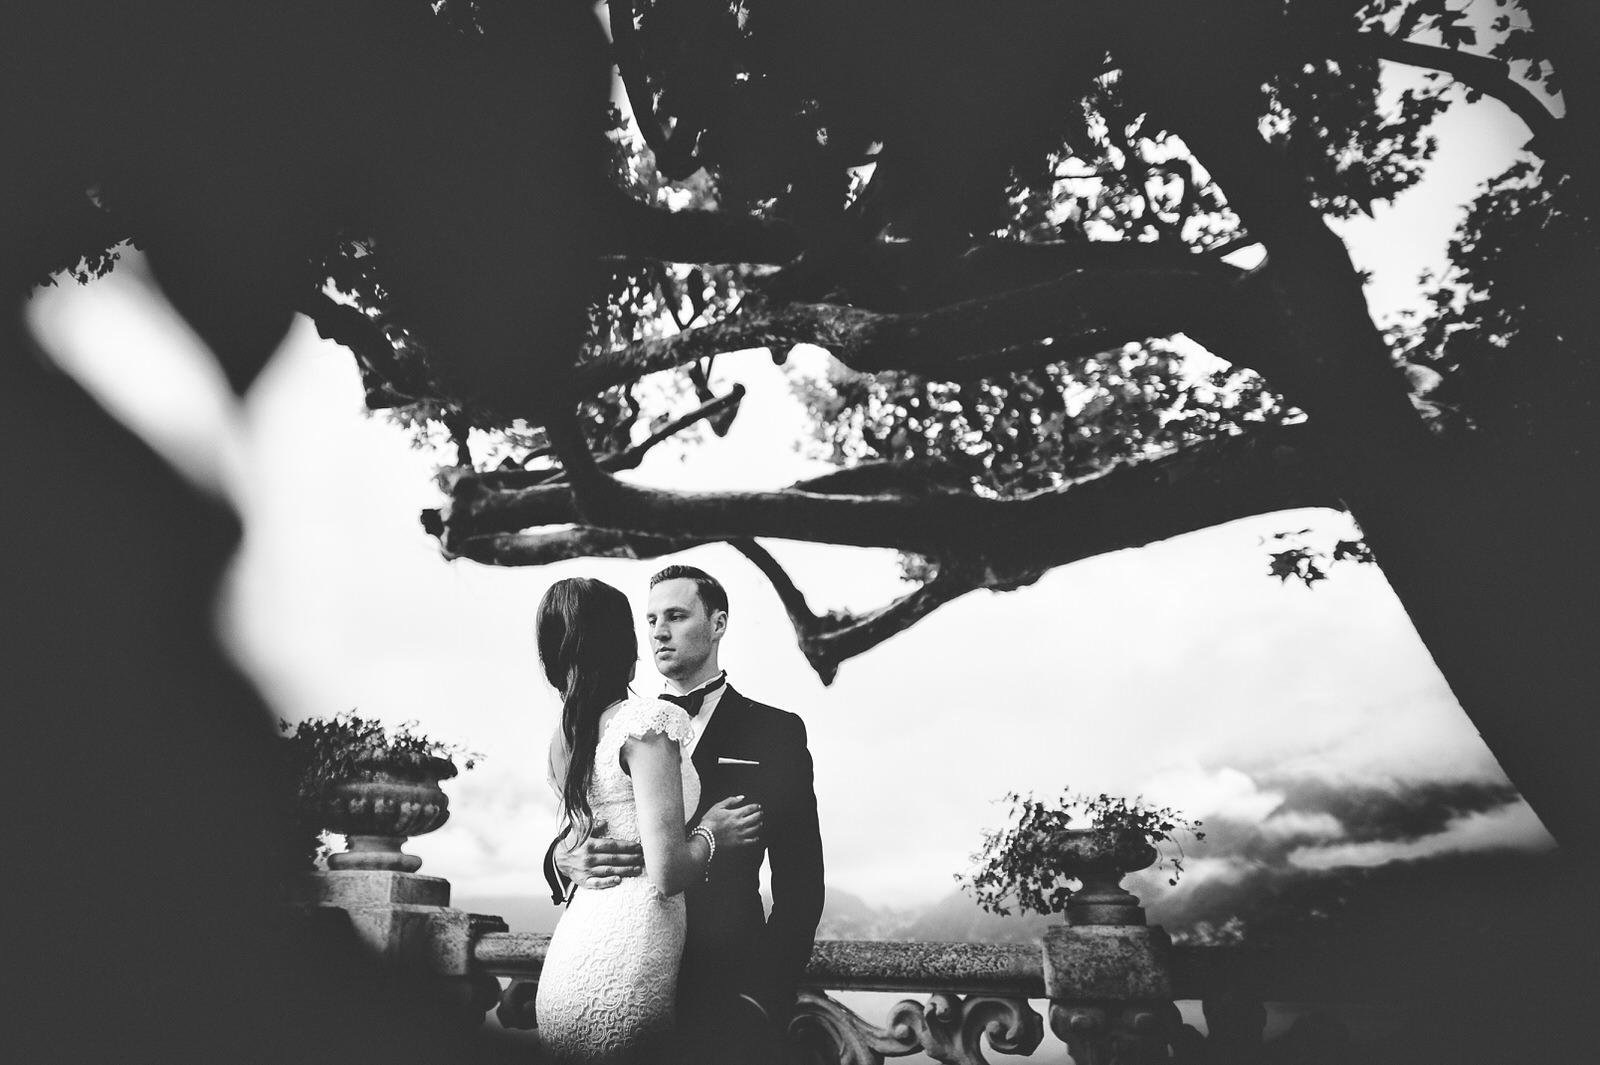 wedding photographer in italy-venice-tuscany-florence-amalfi coast-como lake-villa del balbianello-siena-amalfi-ravello-belmond-villa cimbrone5